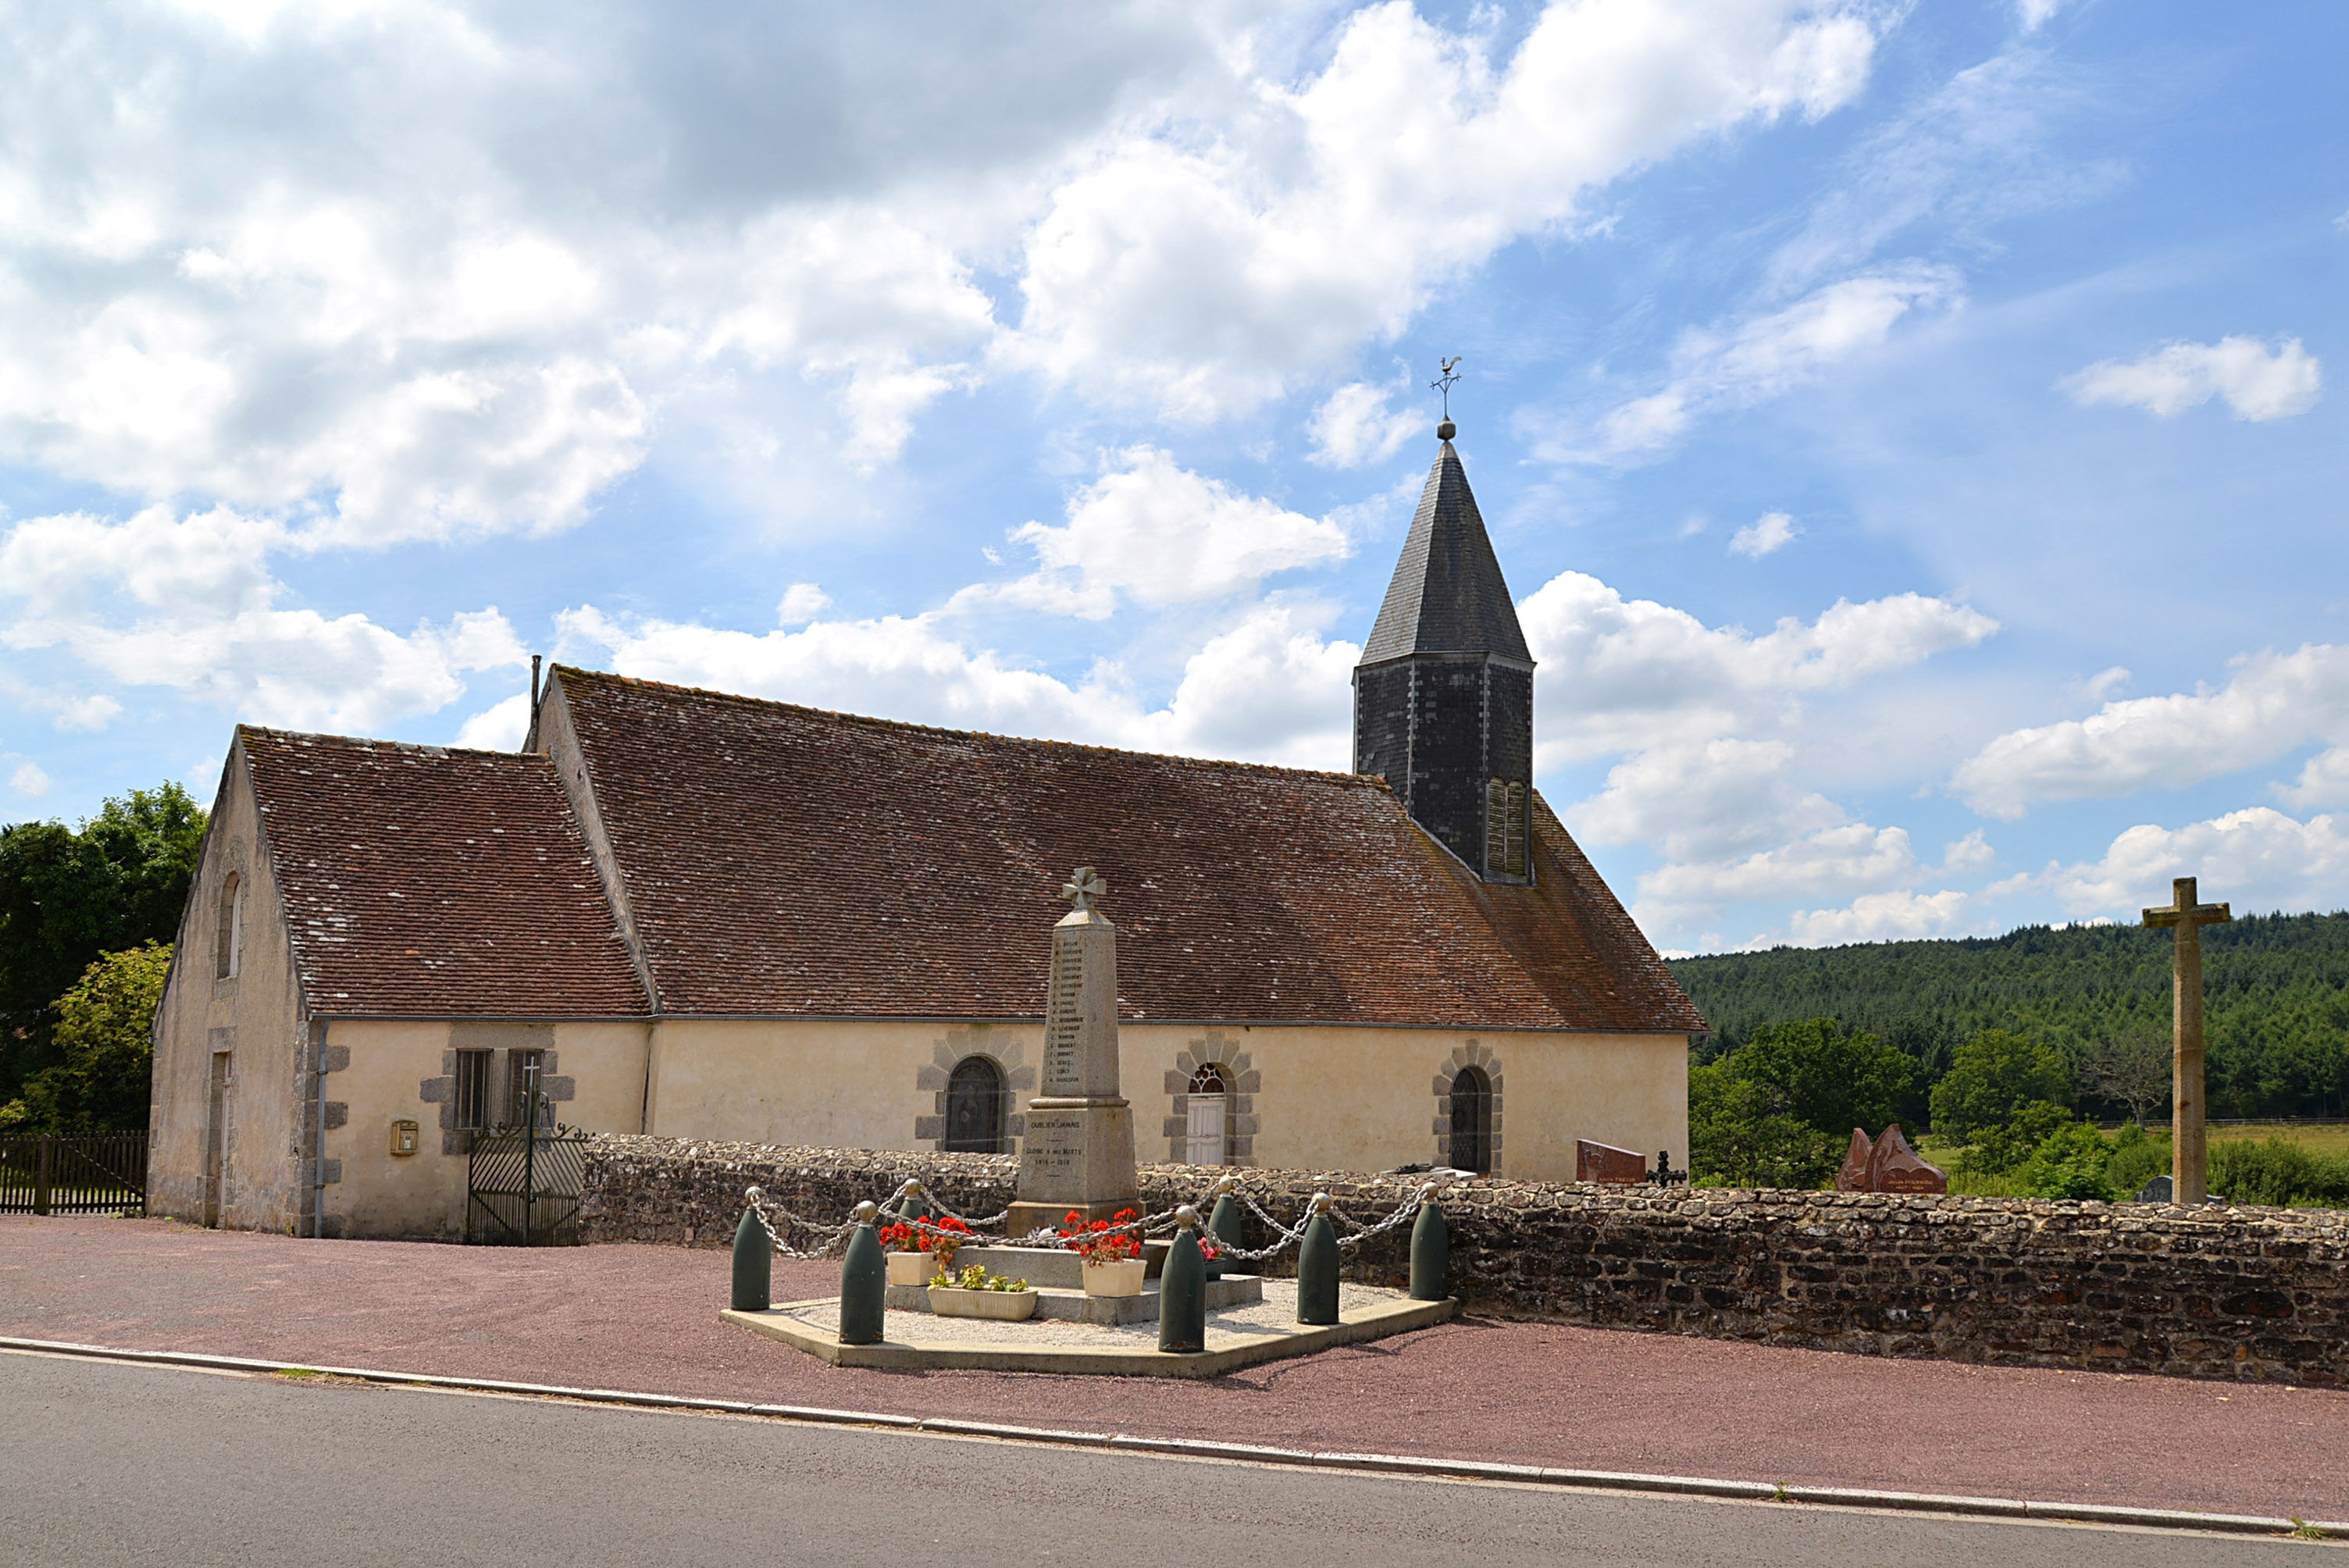 La Lande-de-Goult, Orne, France